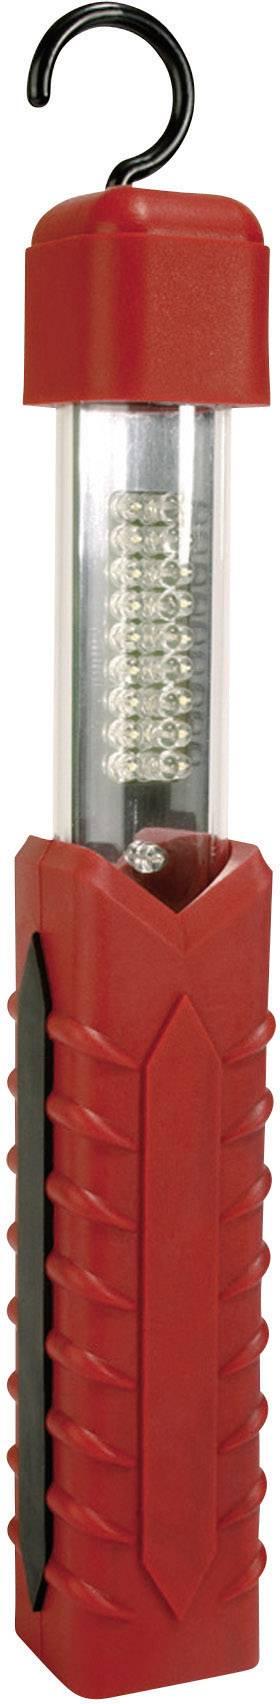 Lampada da lavoro LED a batter